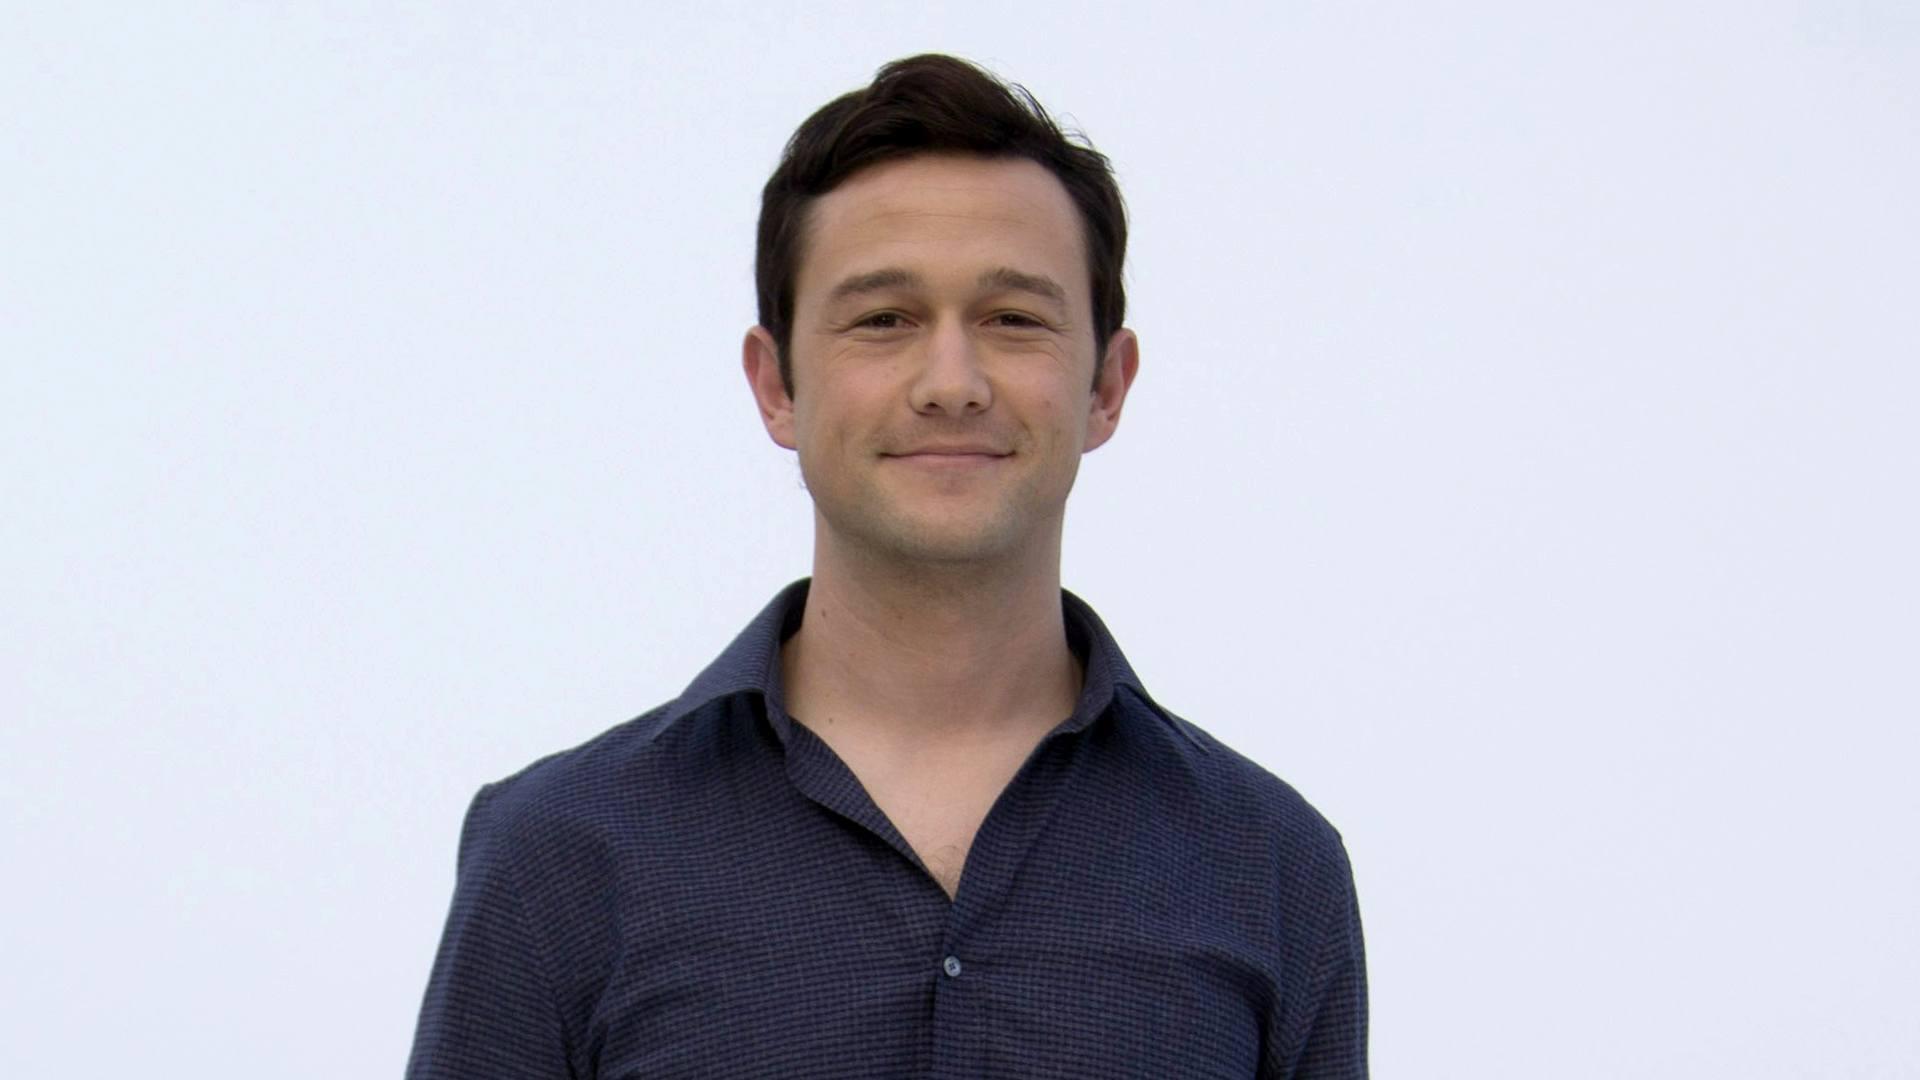 joseph gordon levitt son born 2015 gossip